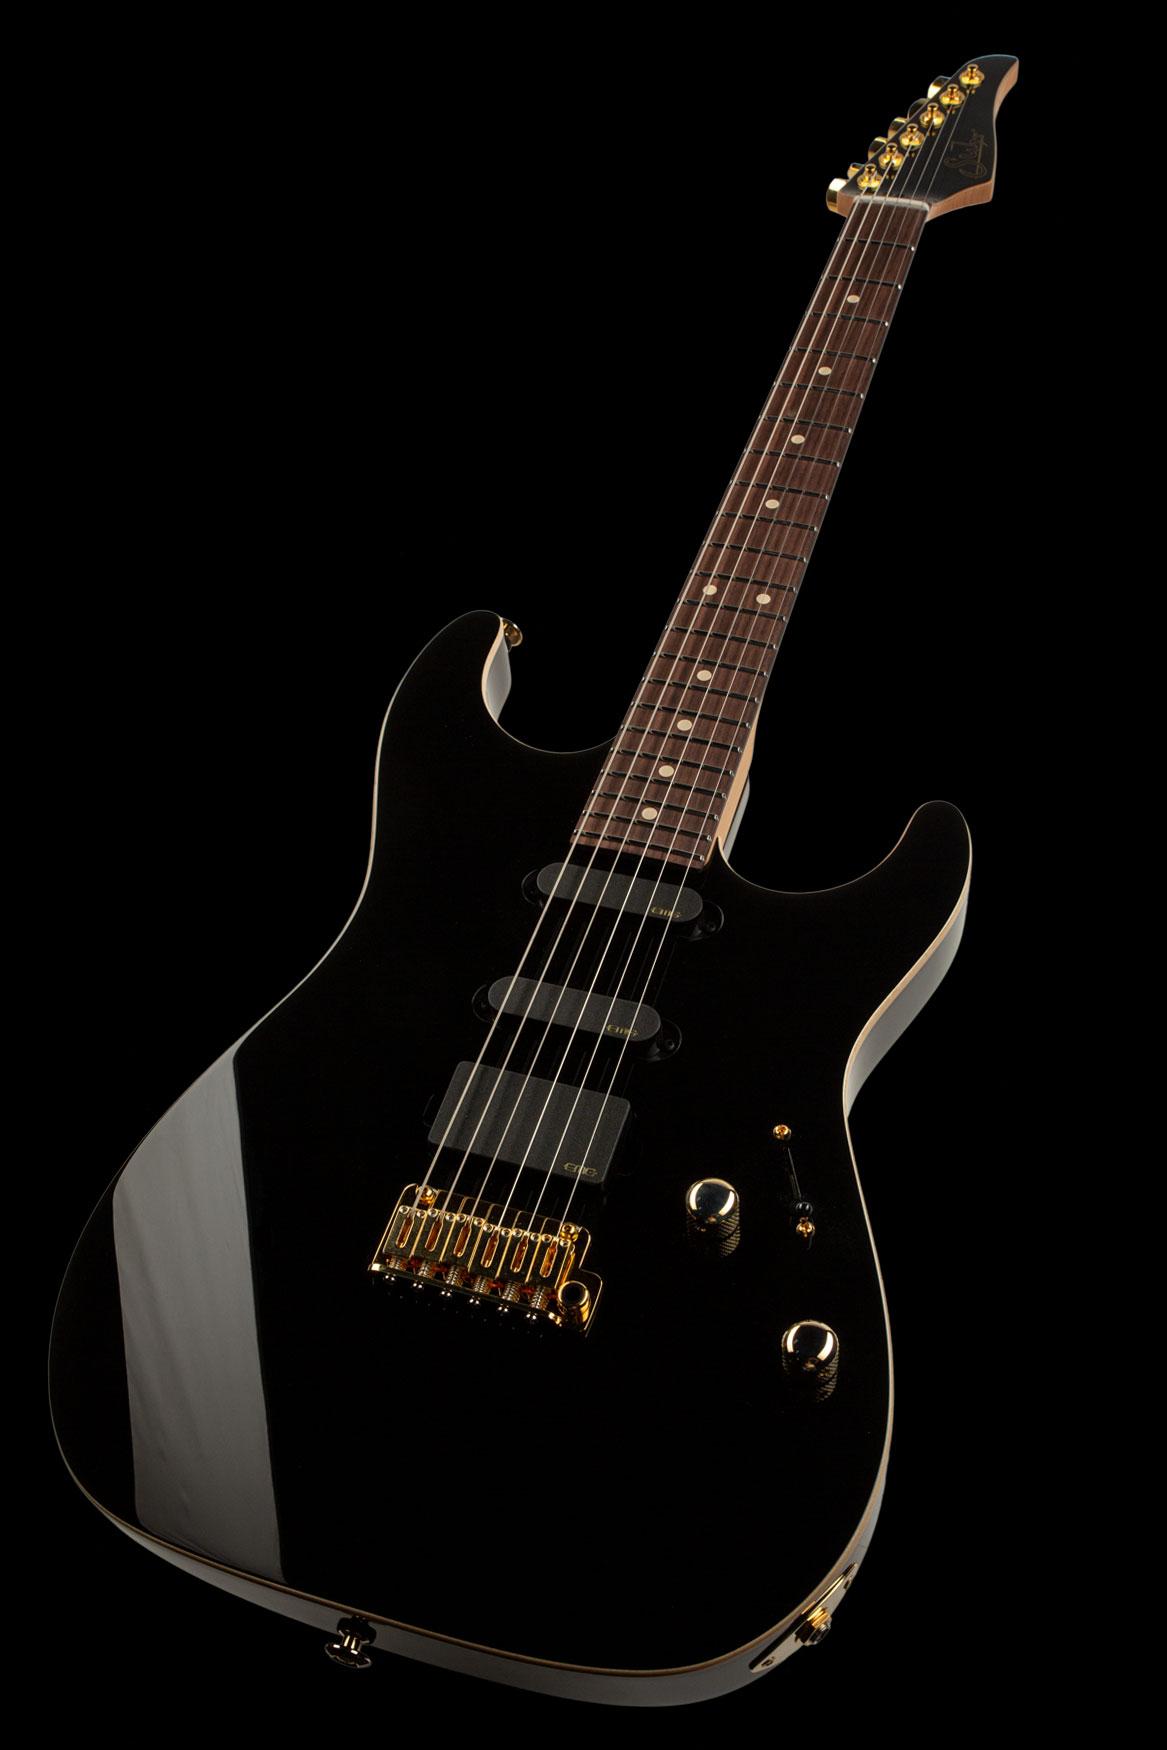 01-LTD-0020: Standard Legacy, Black, Gotoh 510